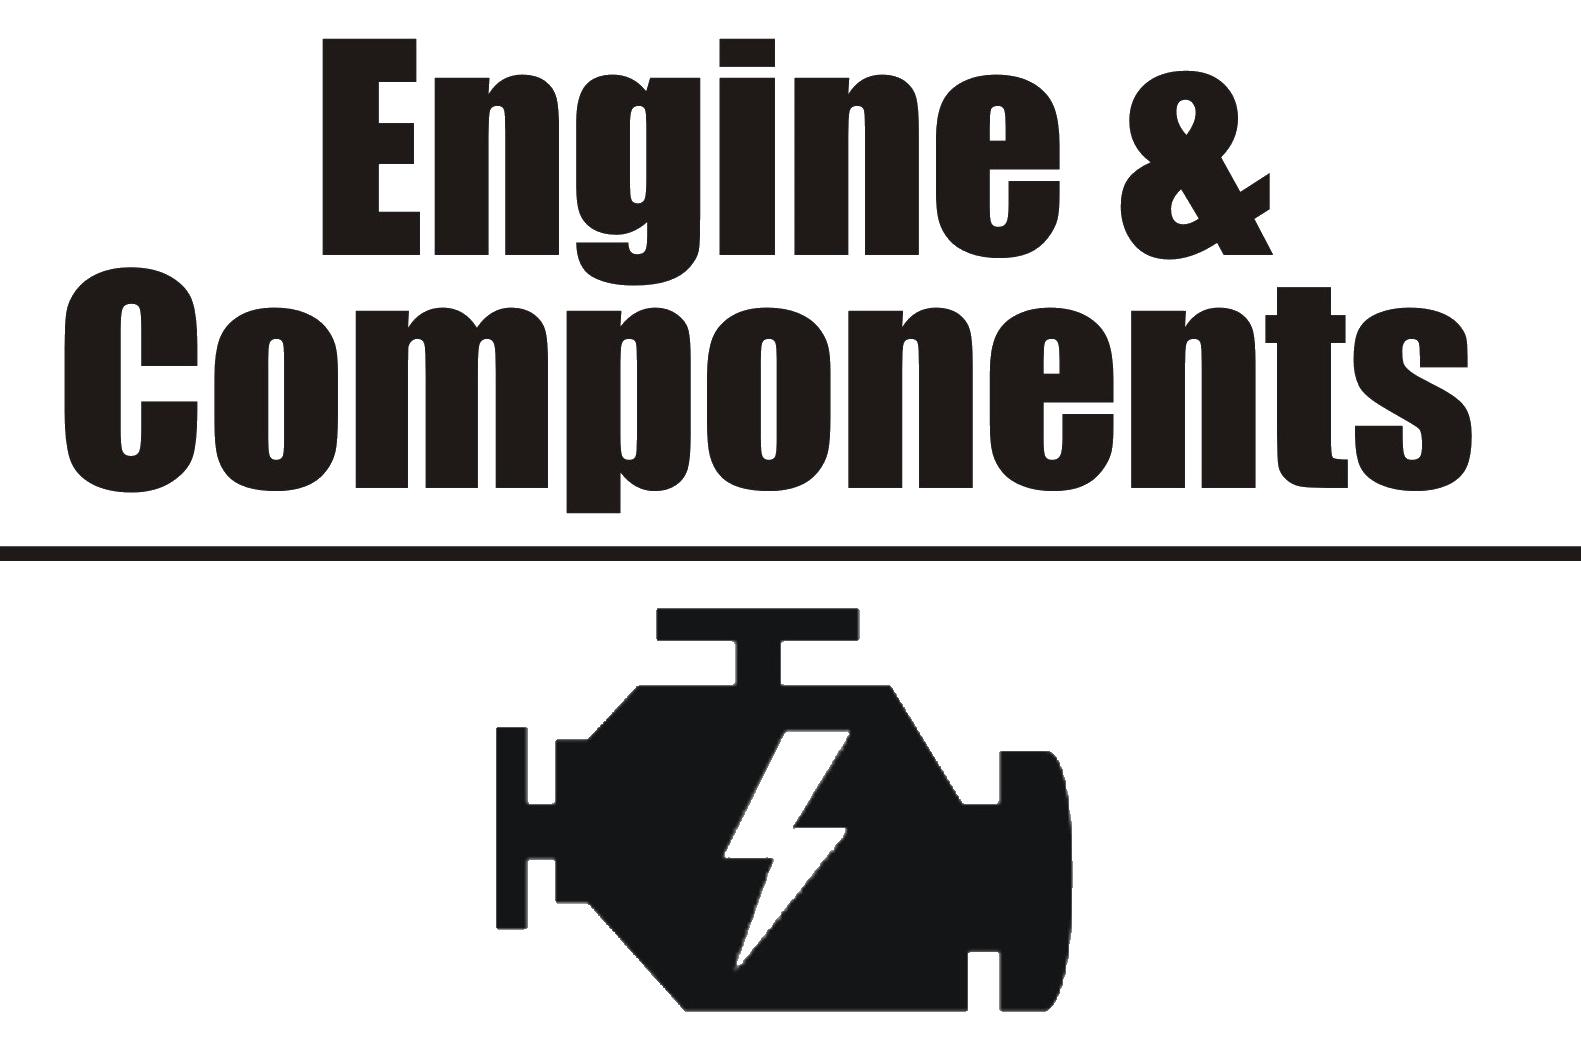 873 bobcat engine - 873 Bobcat Engine 45